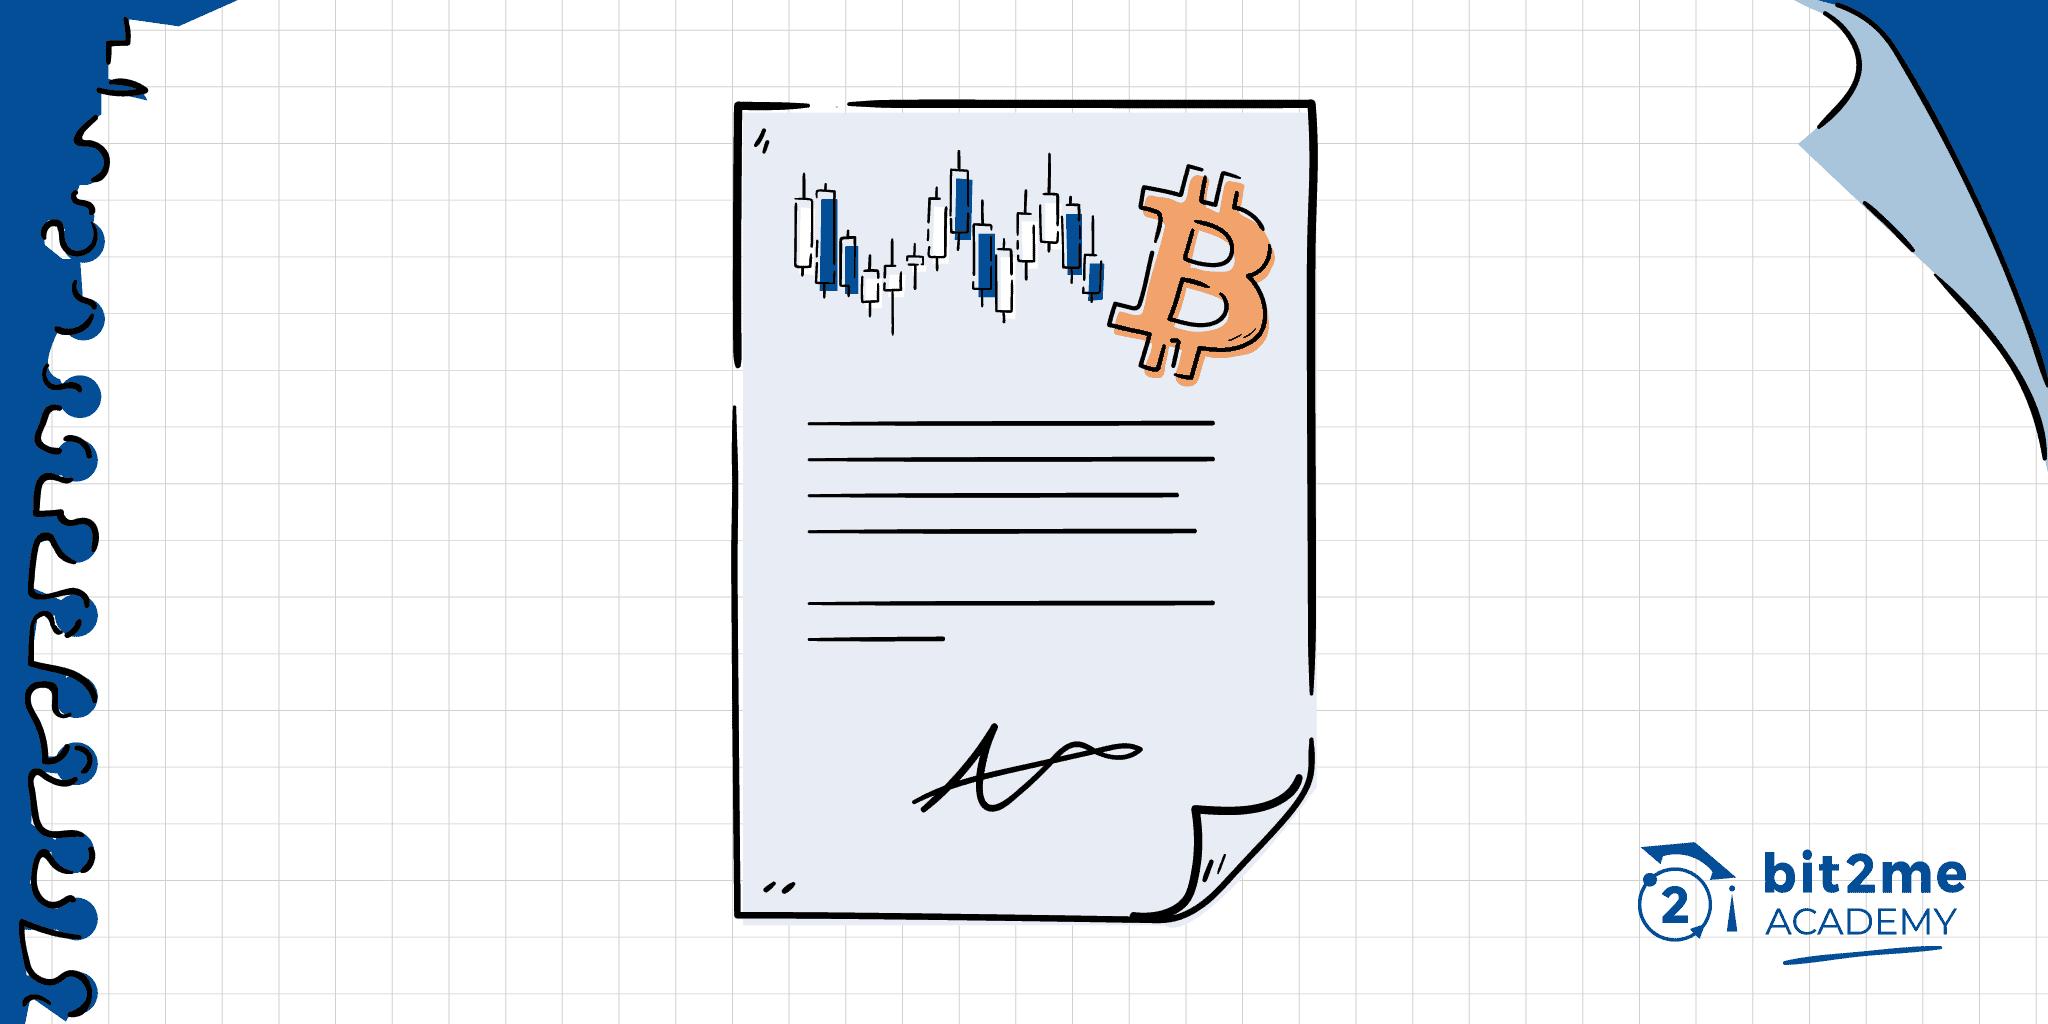 que es cfd, que es cfd bitcoin, cfd bitcoin, cfd criptomonedas, contrato por diferencia